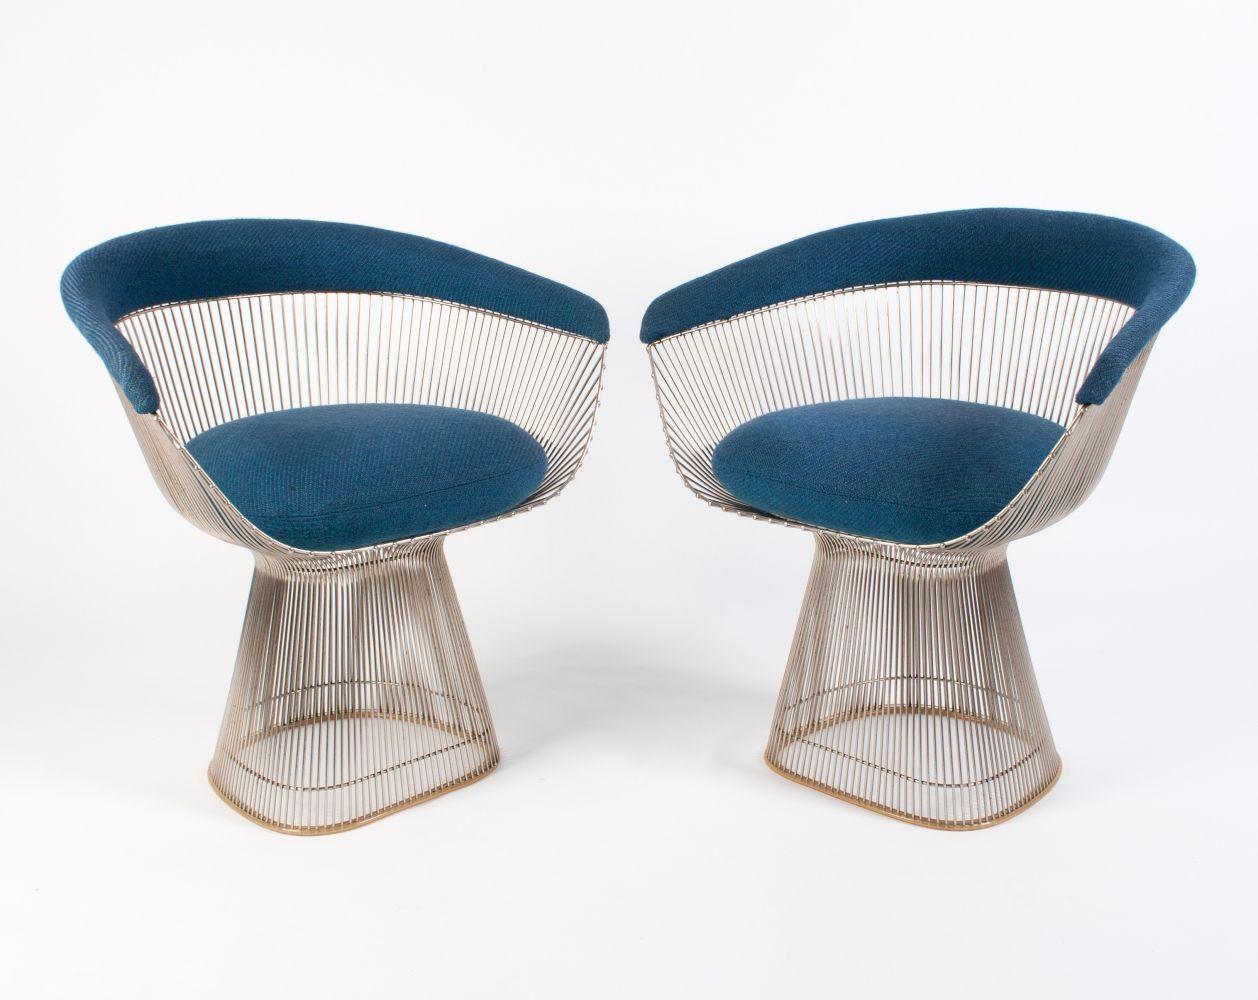 2x Vintage Warren Platner Arm Chair In Blue Wool 1960s Deco